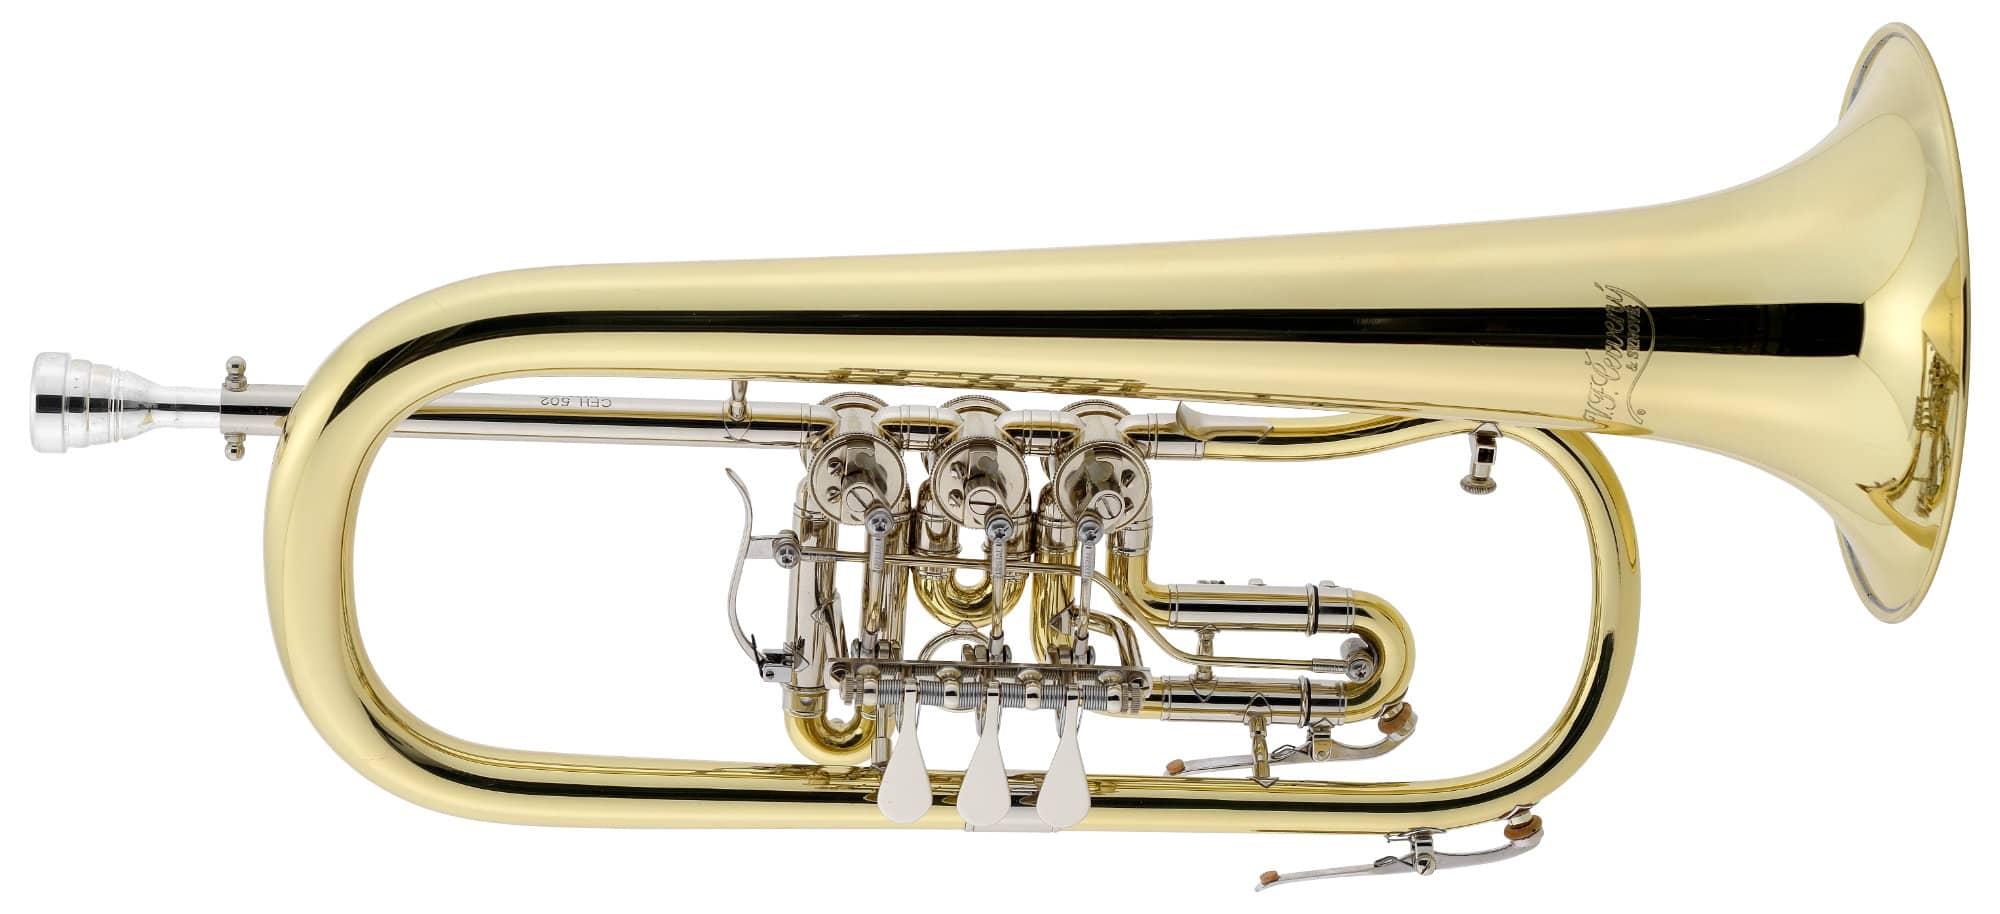 Hoerner - Cerveny CFH502 Flügelhorn - Onlineshop Musikhaus Kirstein